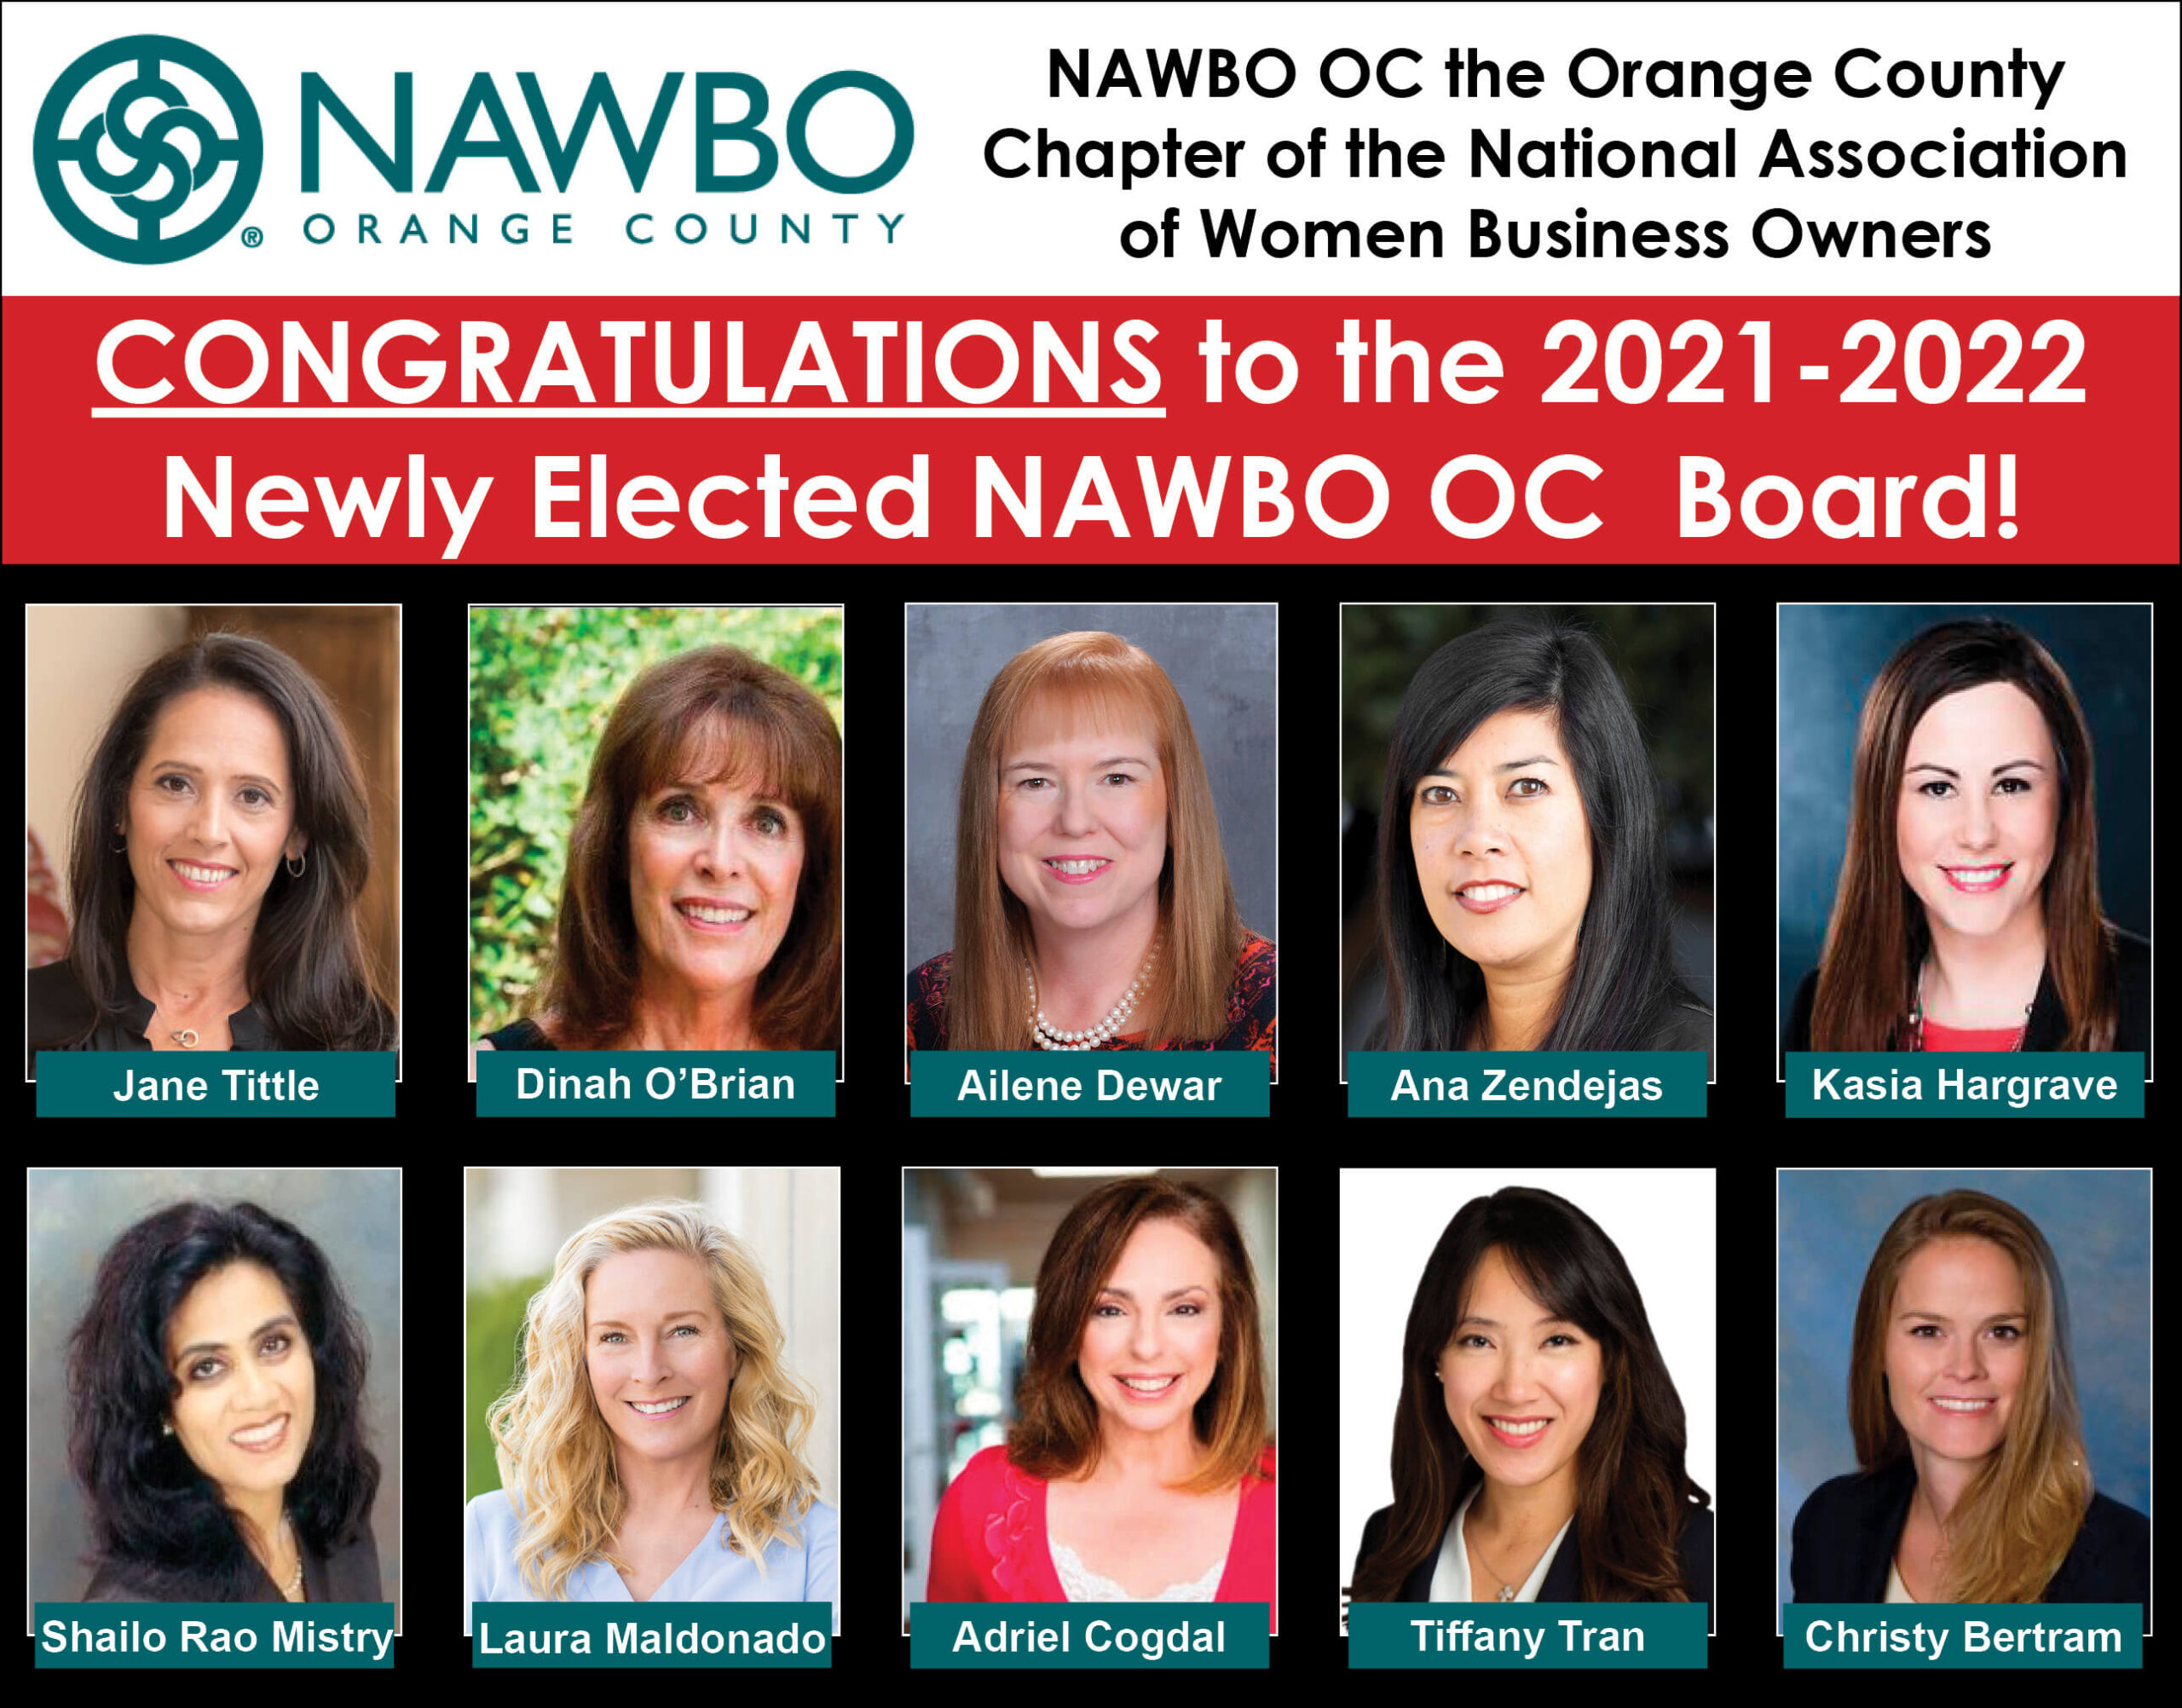 07 Jul NAWBO OC New Board (1)